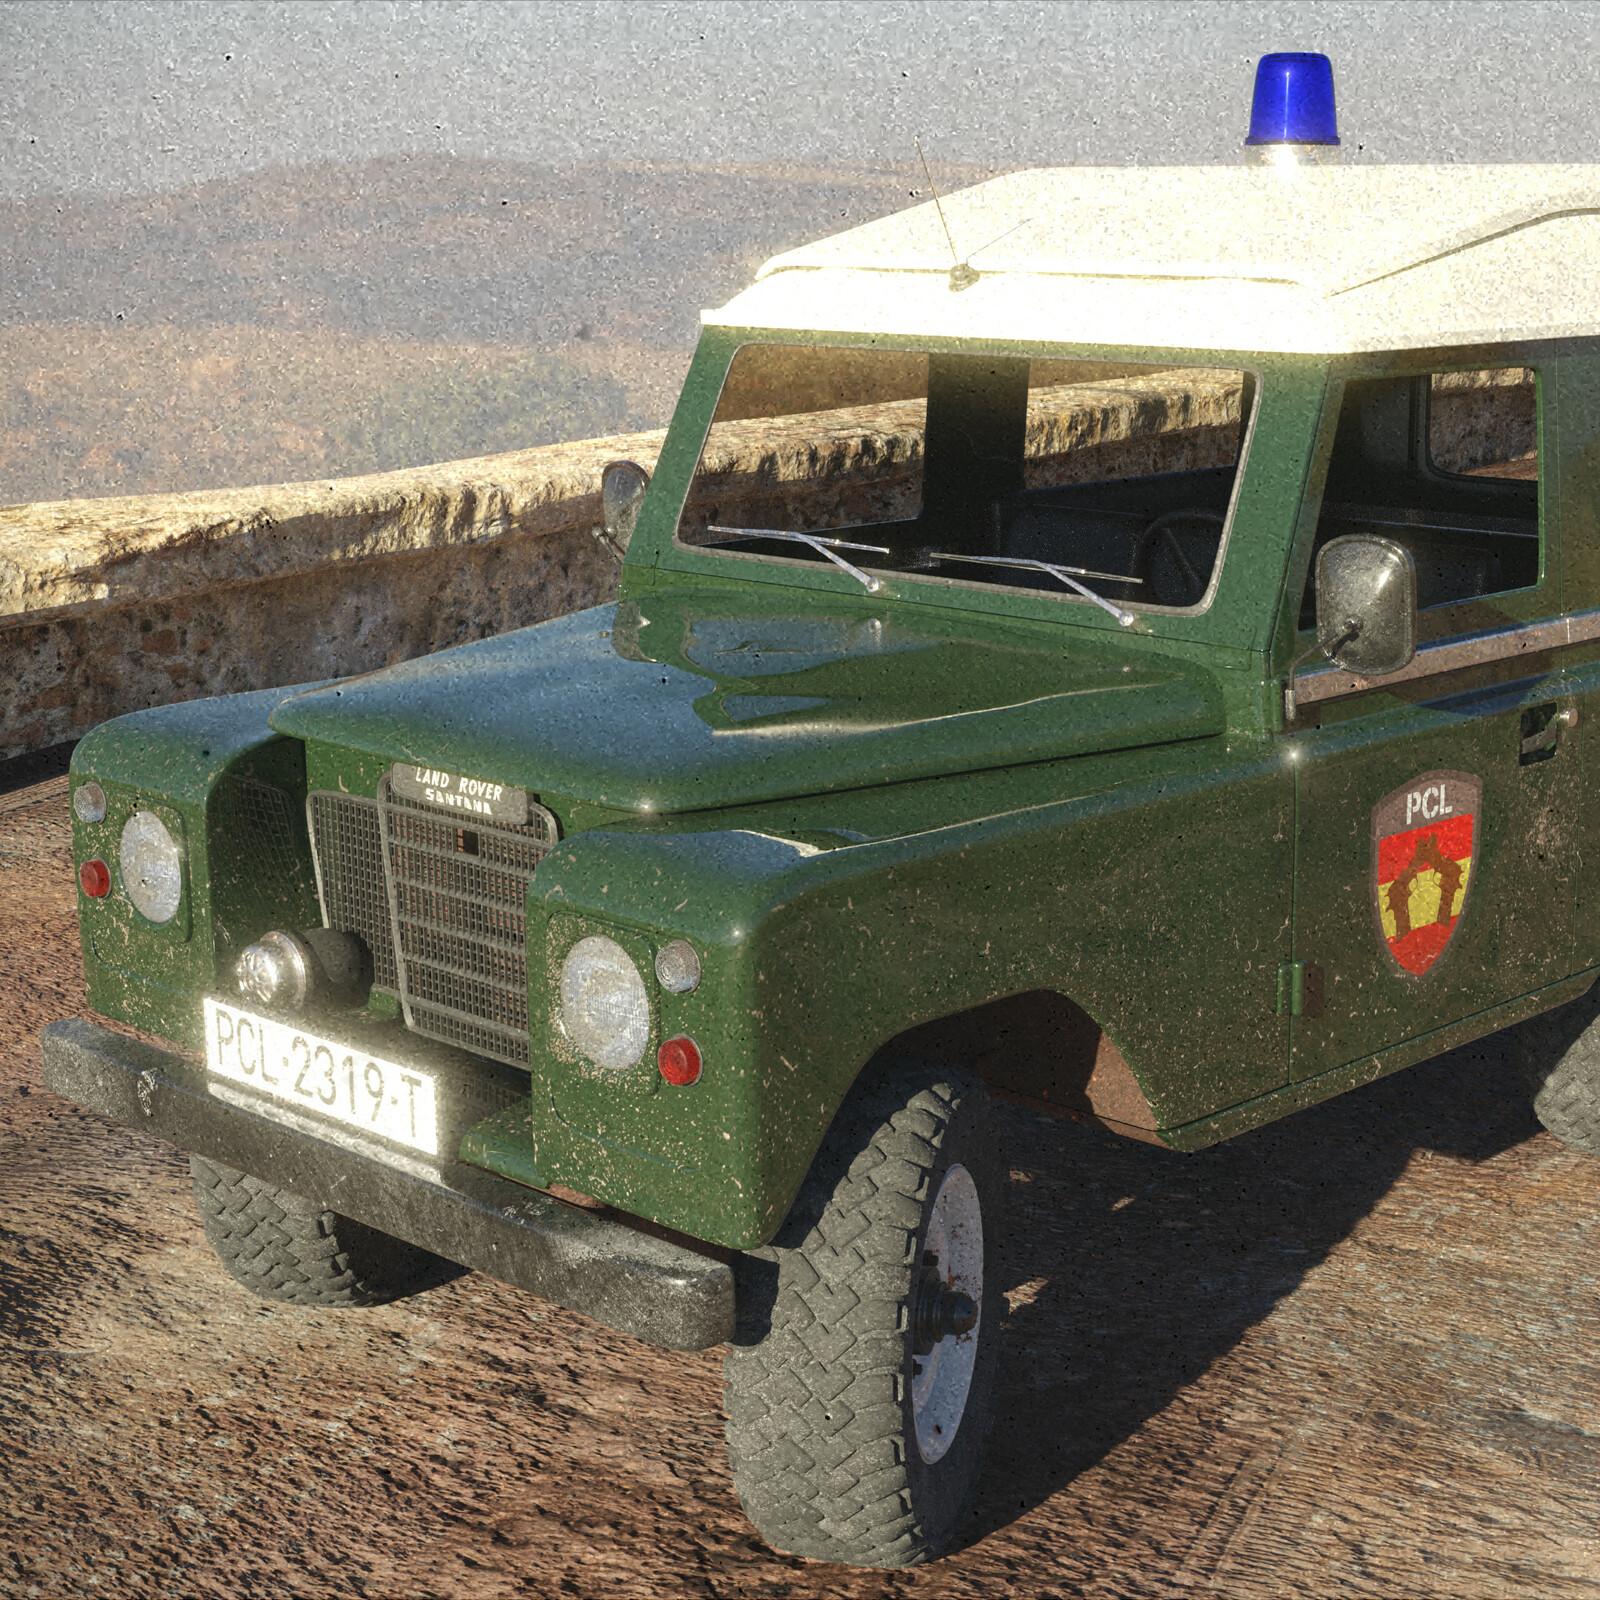 Land-Rover Santana 88 Especial - Police Patrol Vehicle